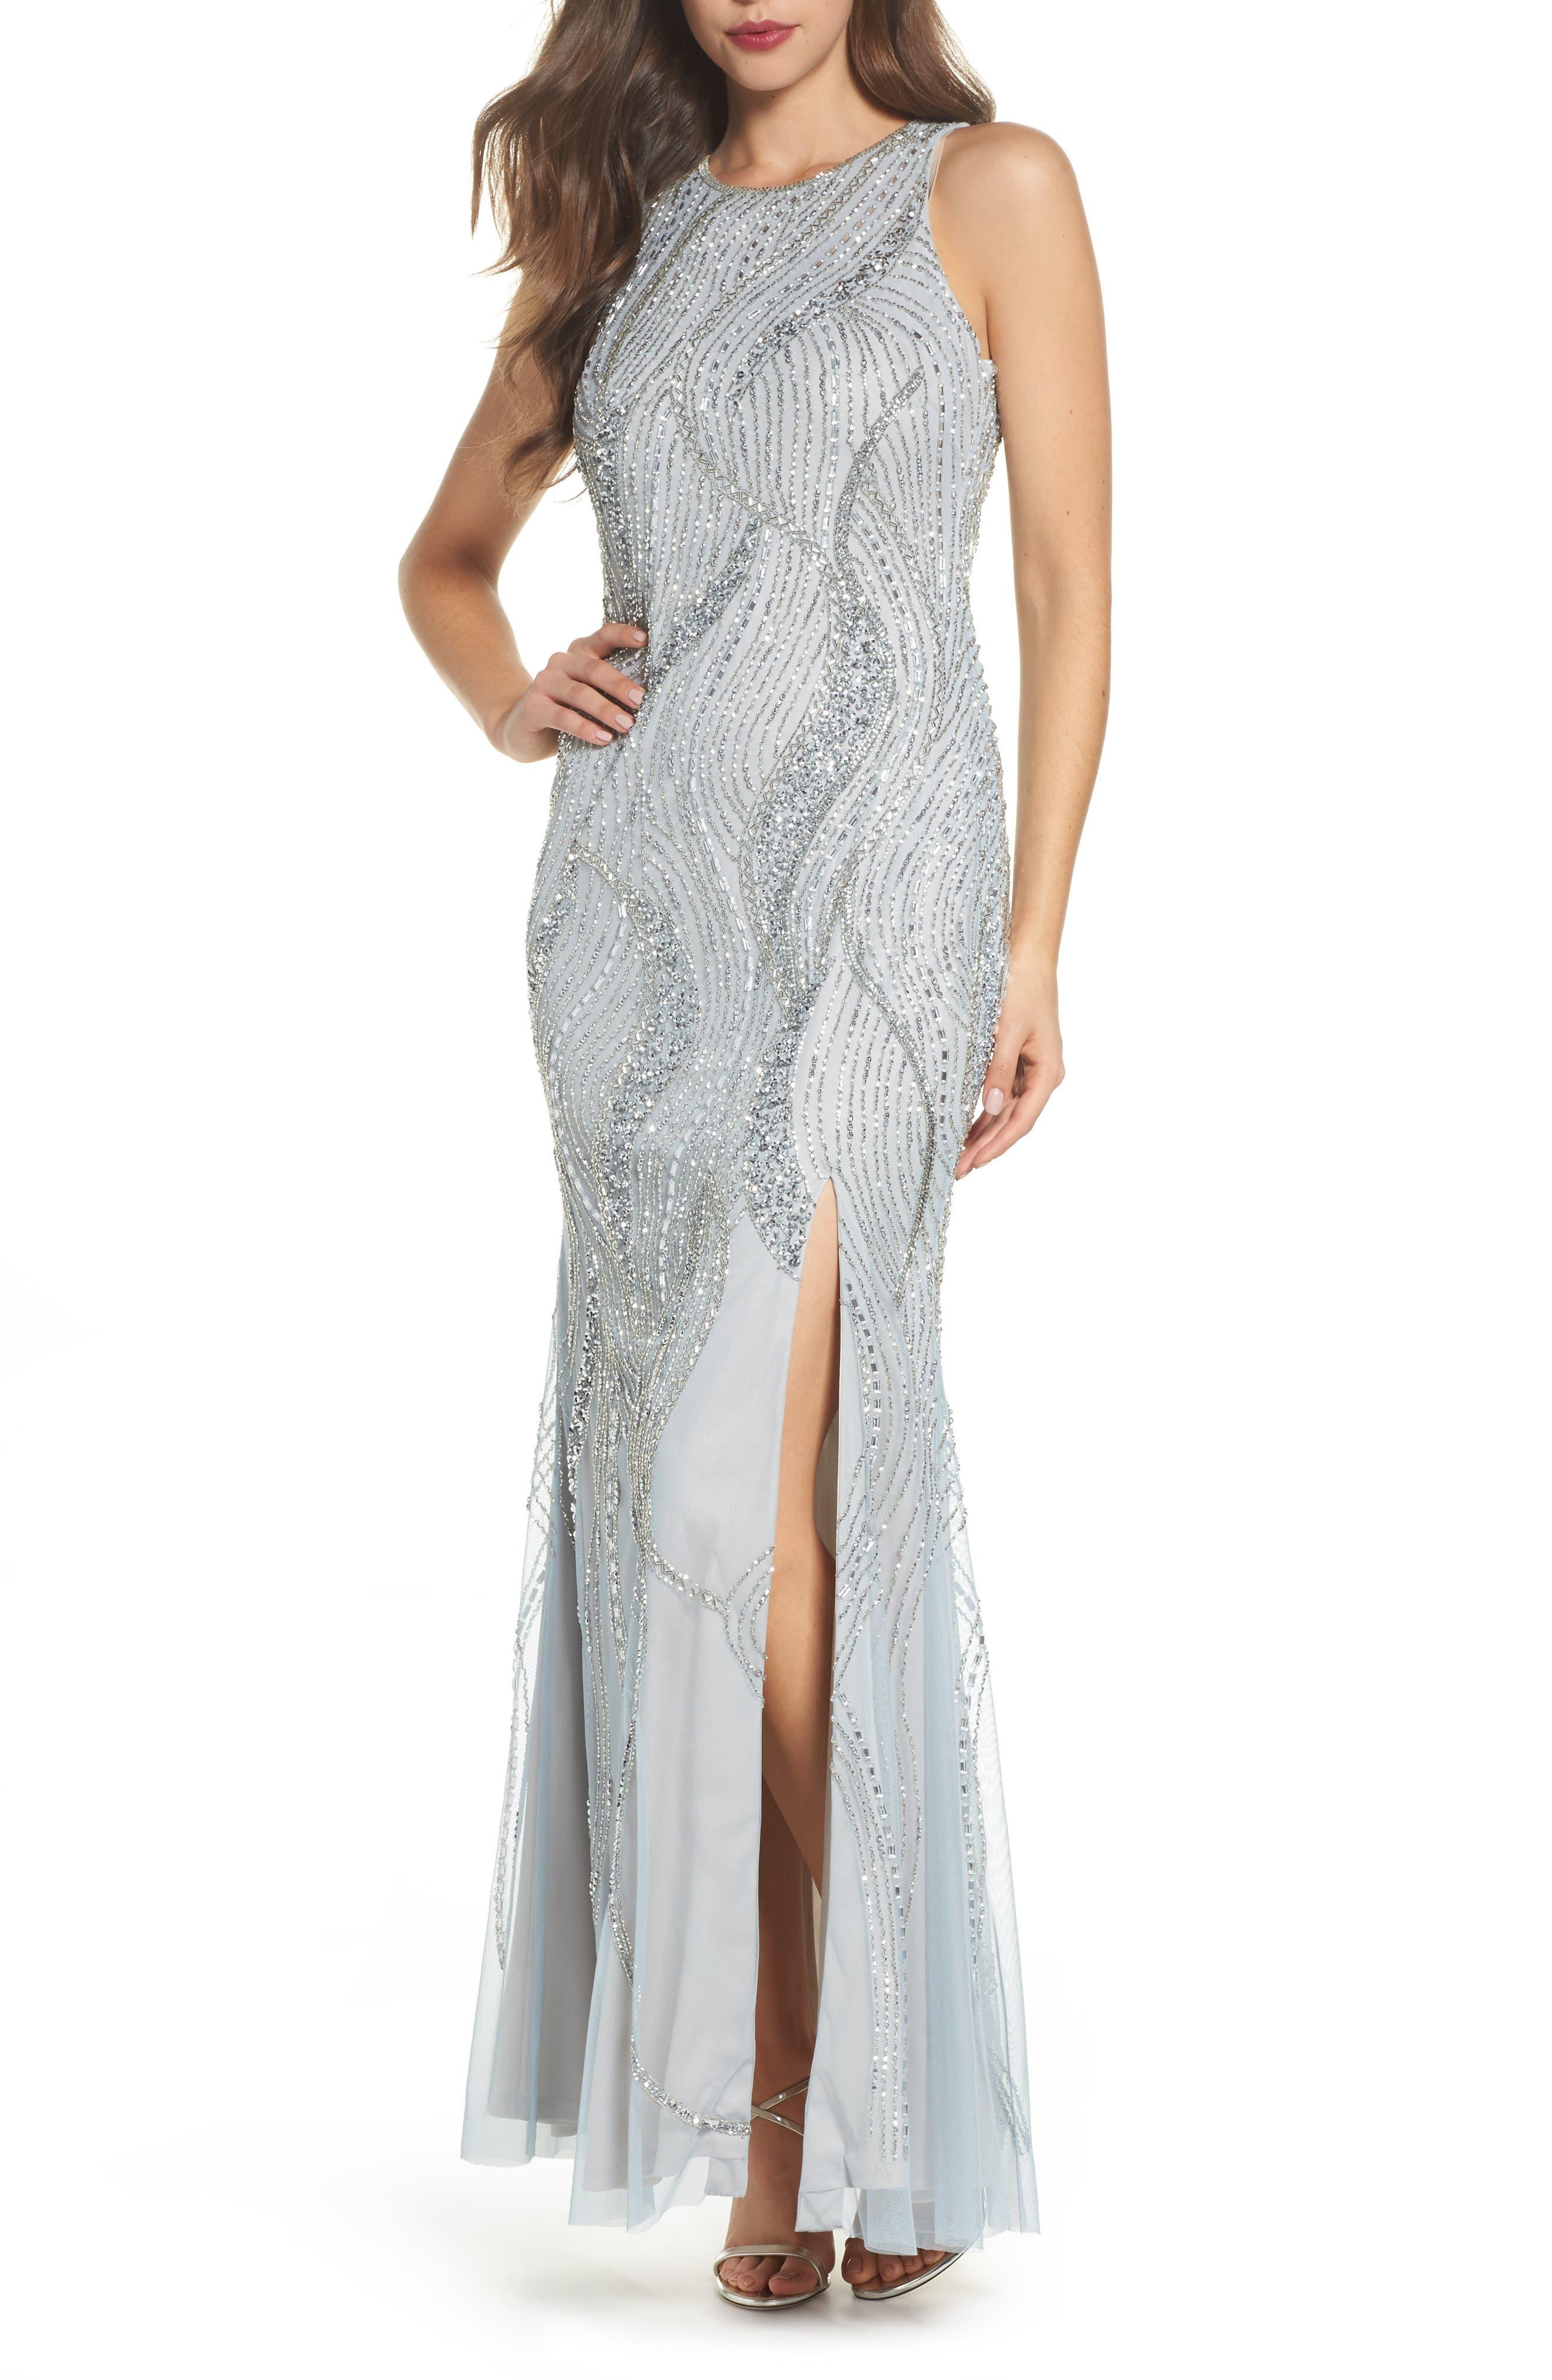 Swirl Beaded Long Dress,                         Main,                         color, 040